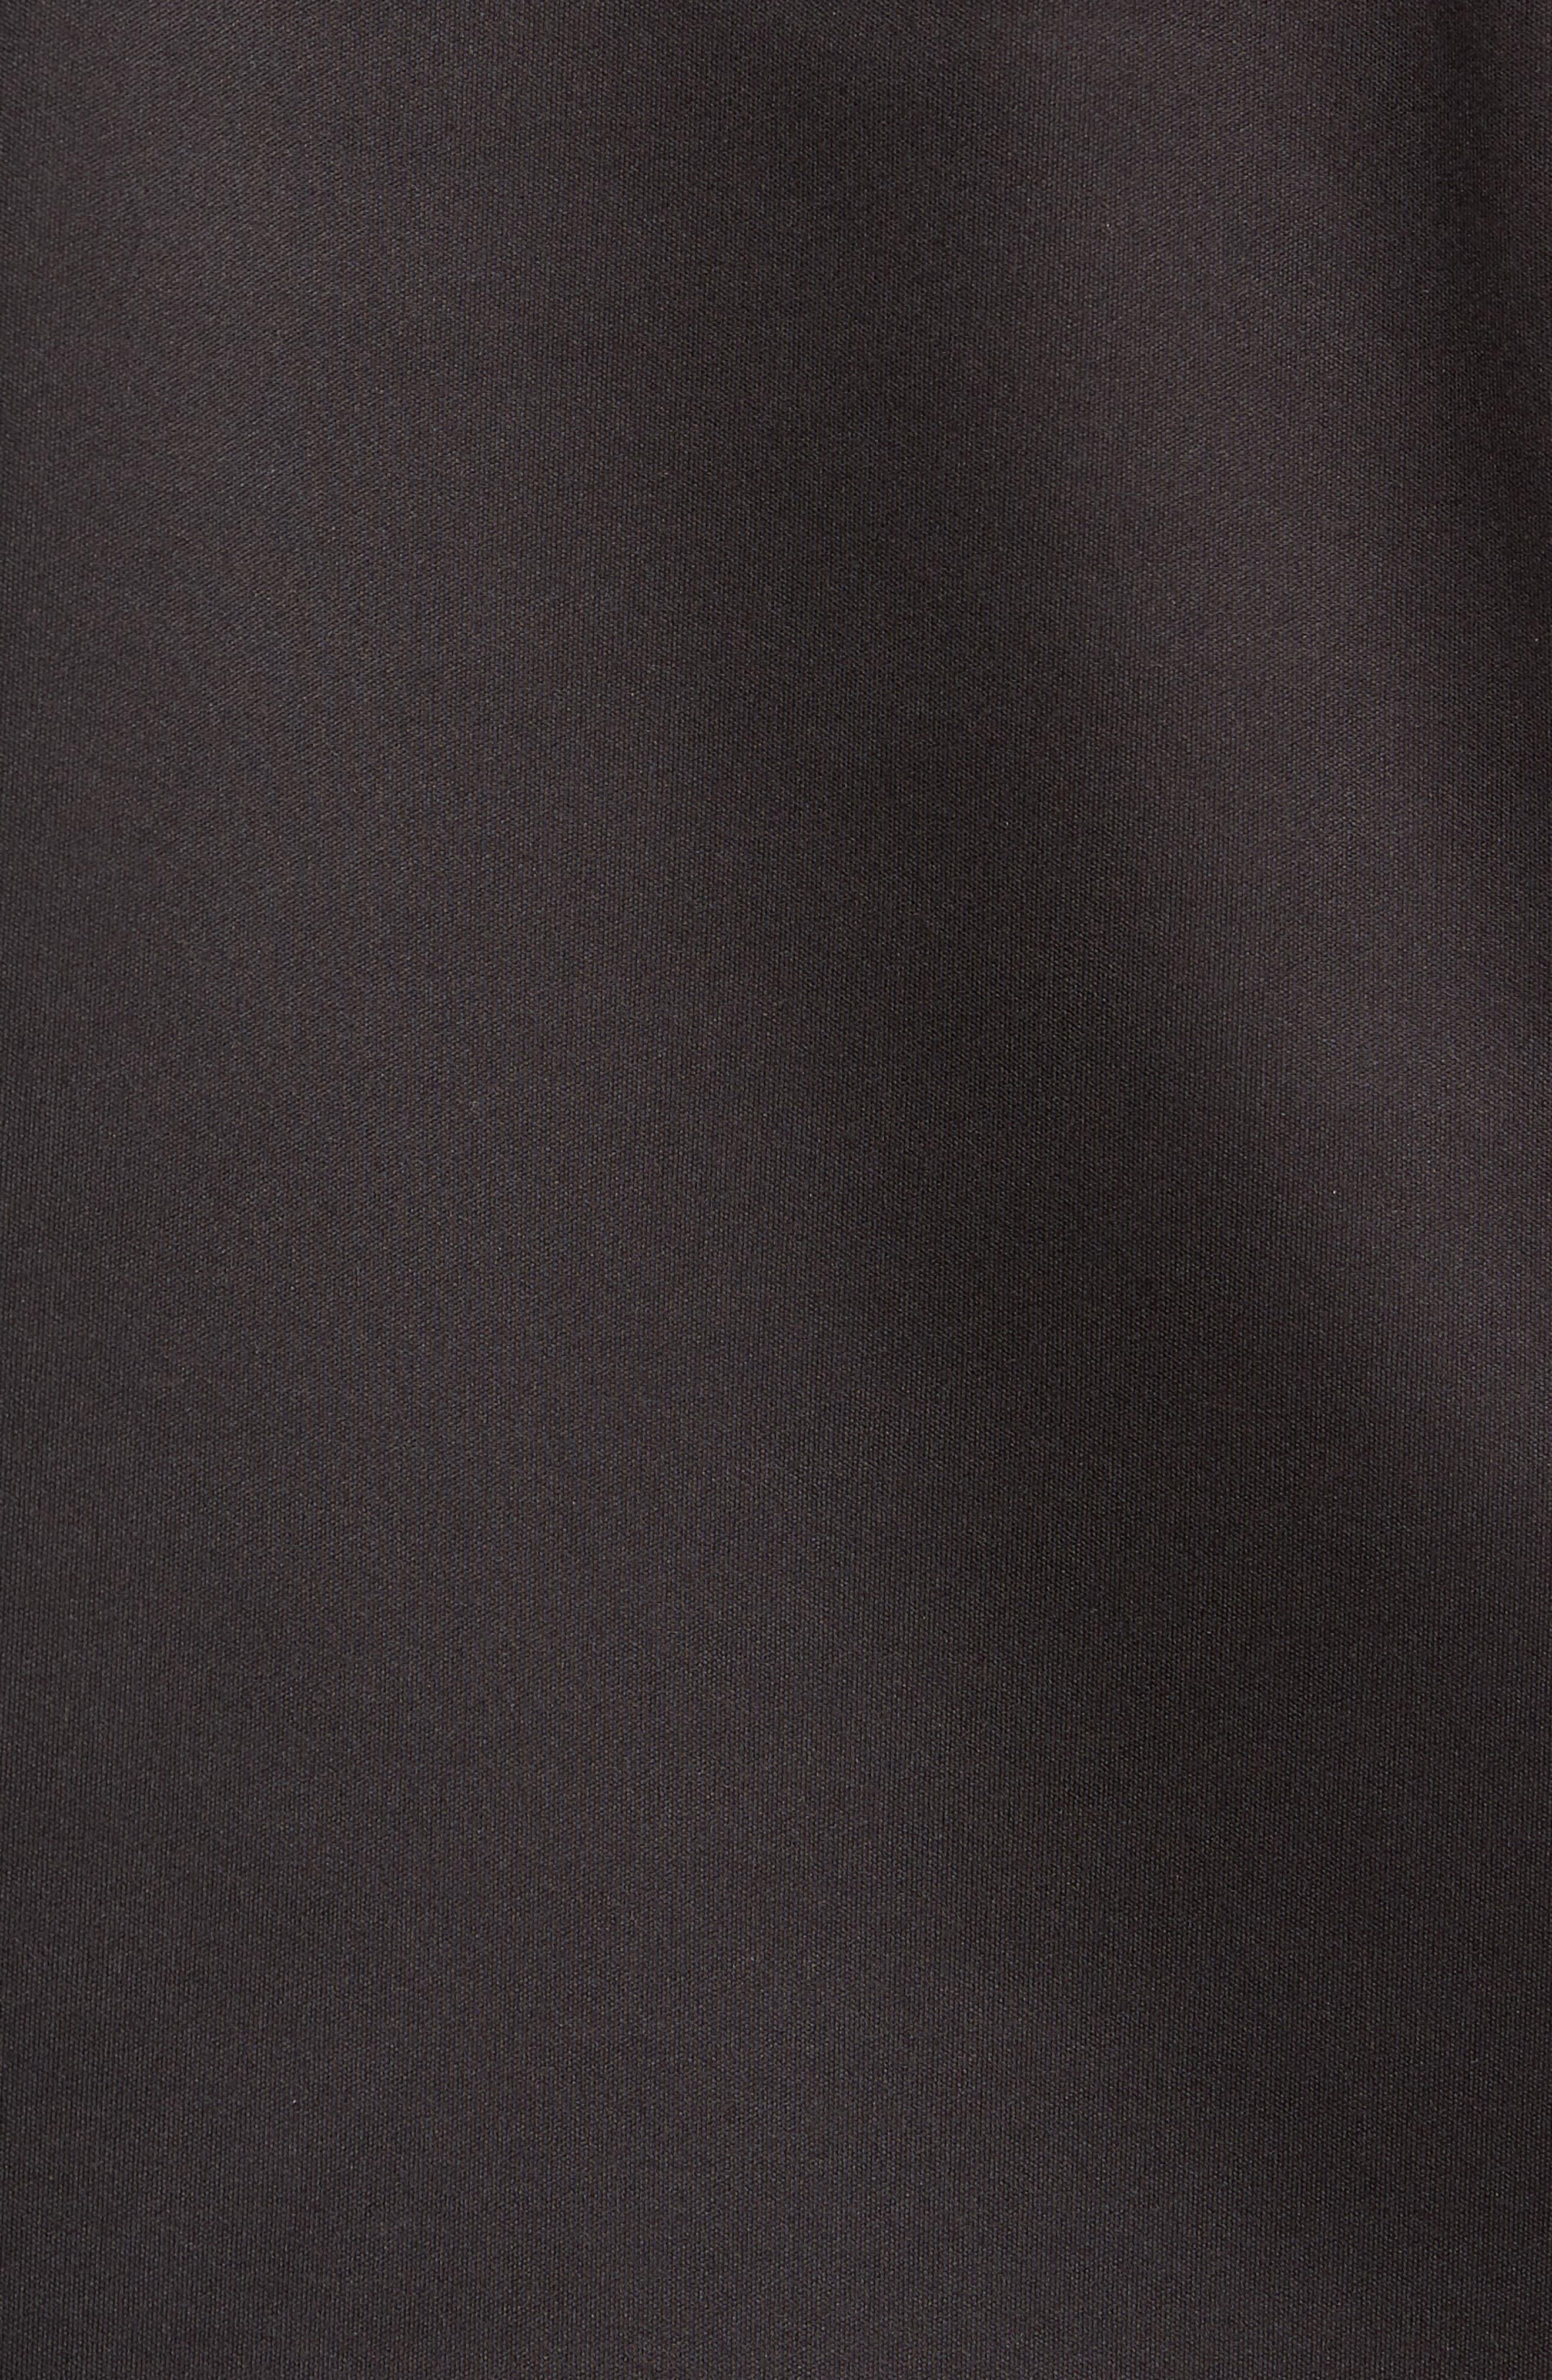 Apex Risor Jacket,                             Alternate thumbnail 6, color,                             TNF BLACK/ TNF BLACK